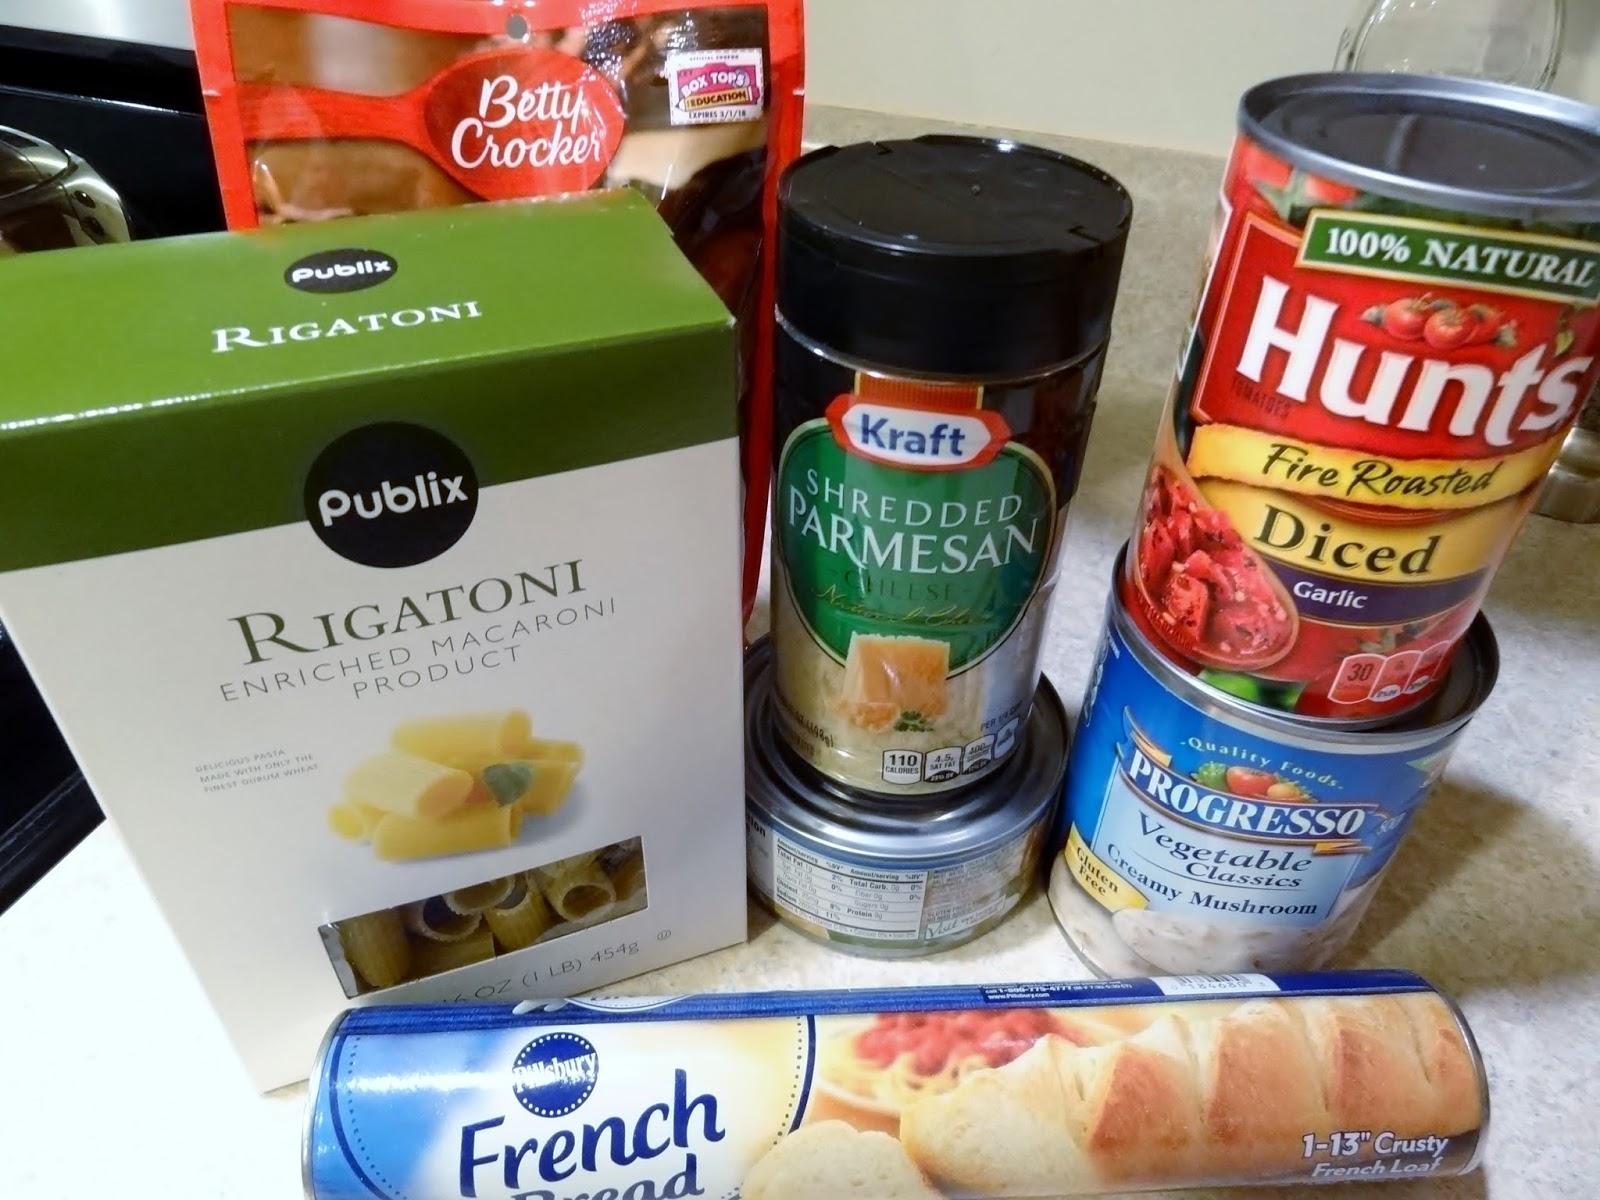 #PublixVivaItalia raid the pantry dinner